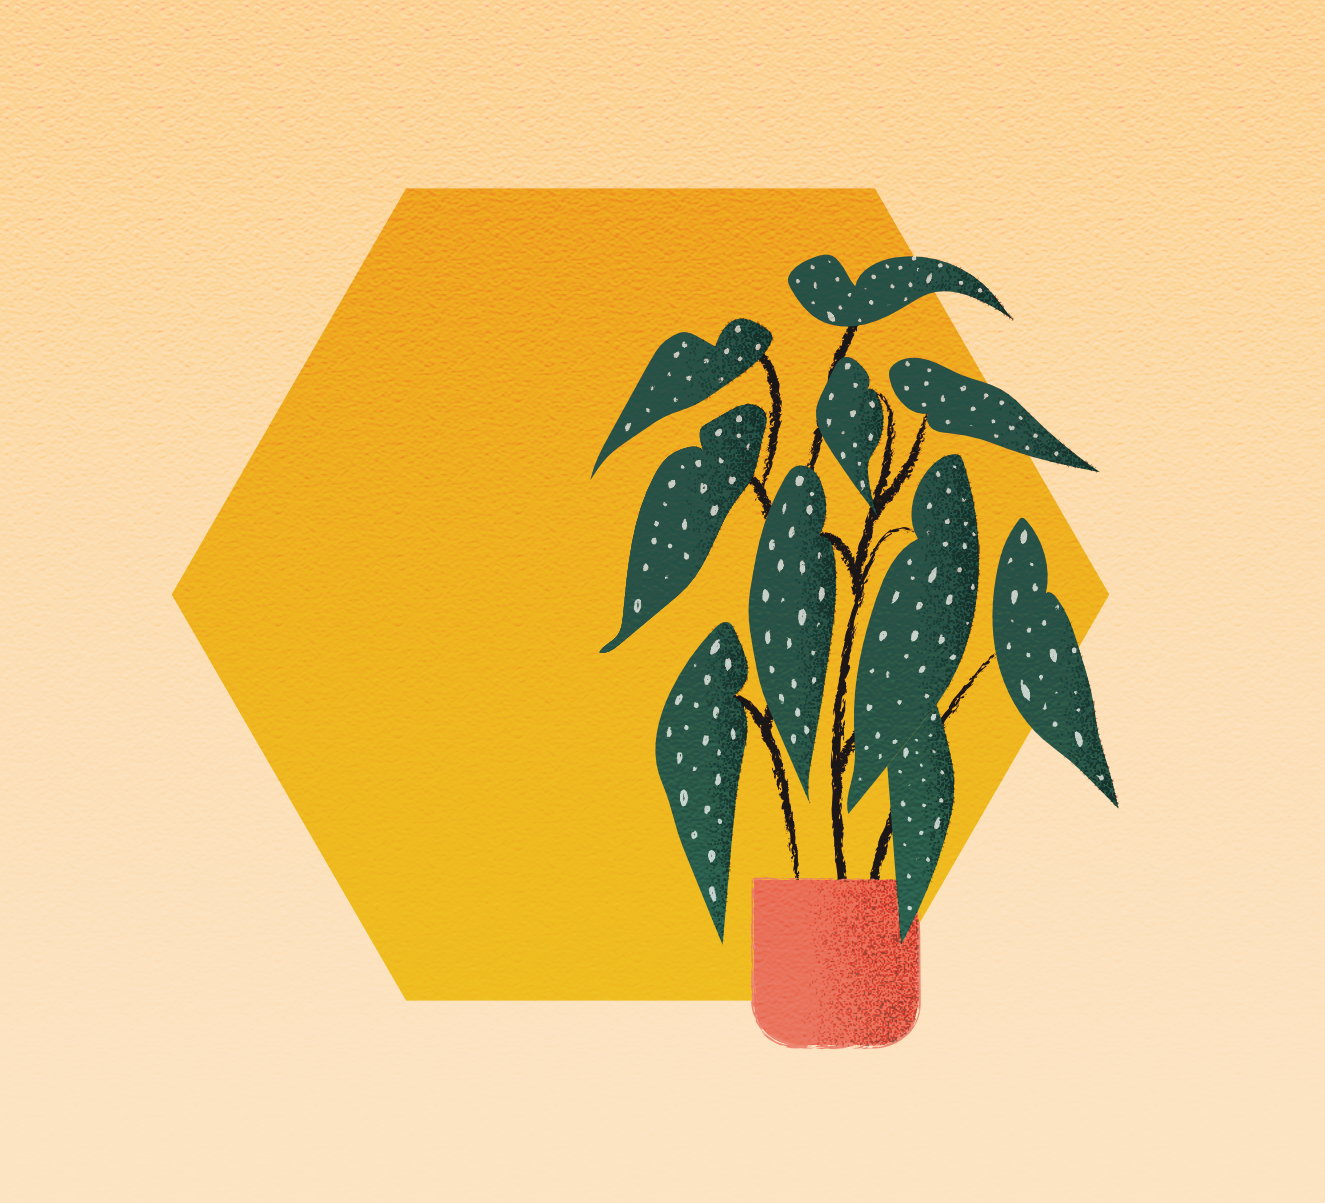 wijb.design portfolio gallery - plant